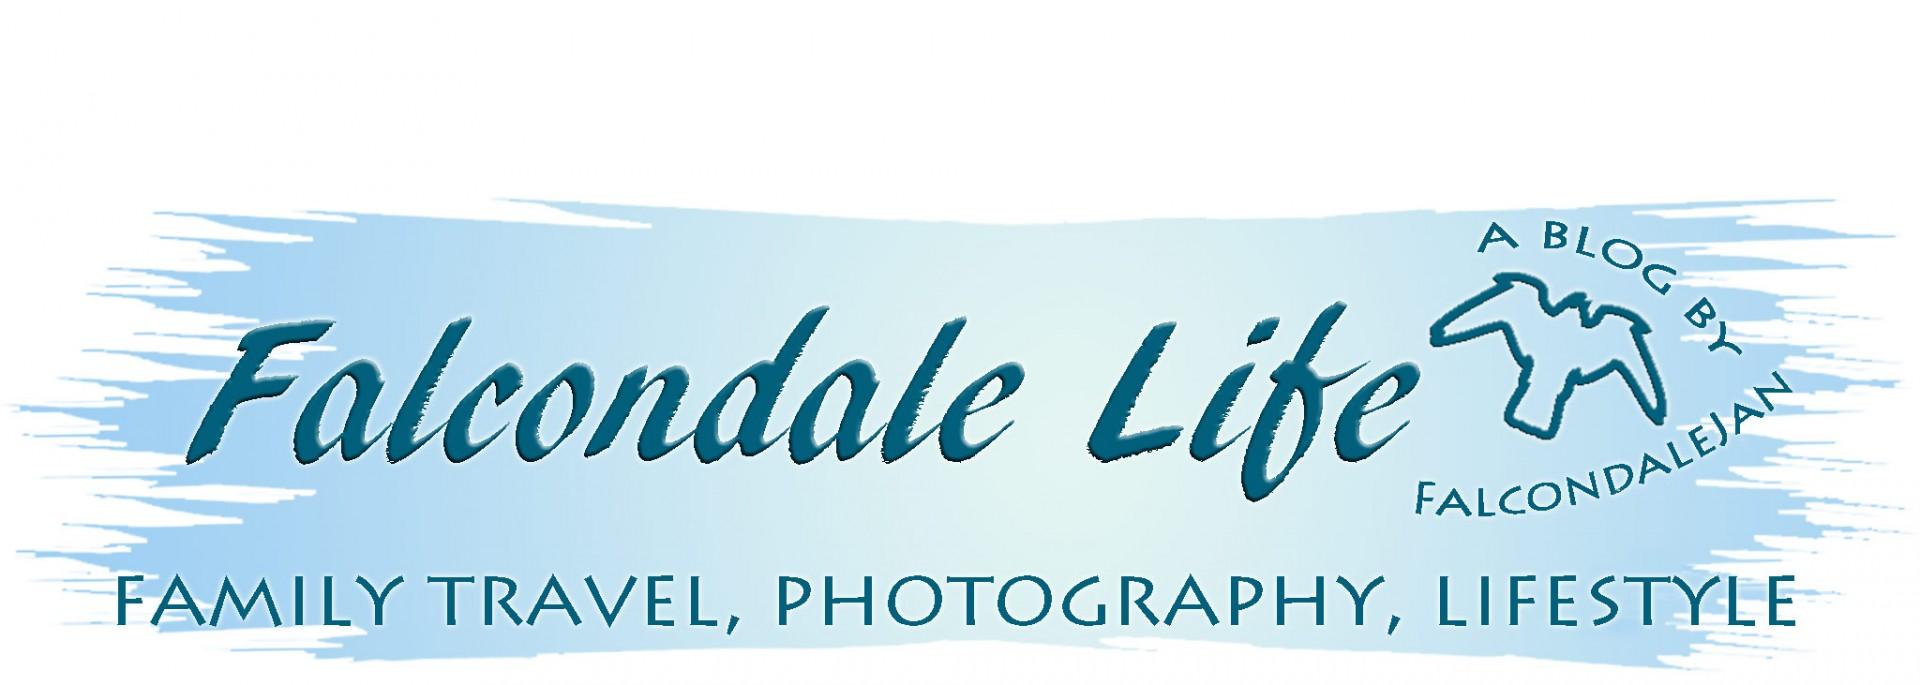 falcondale life